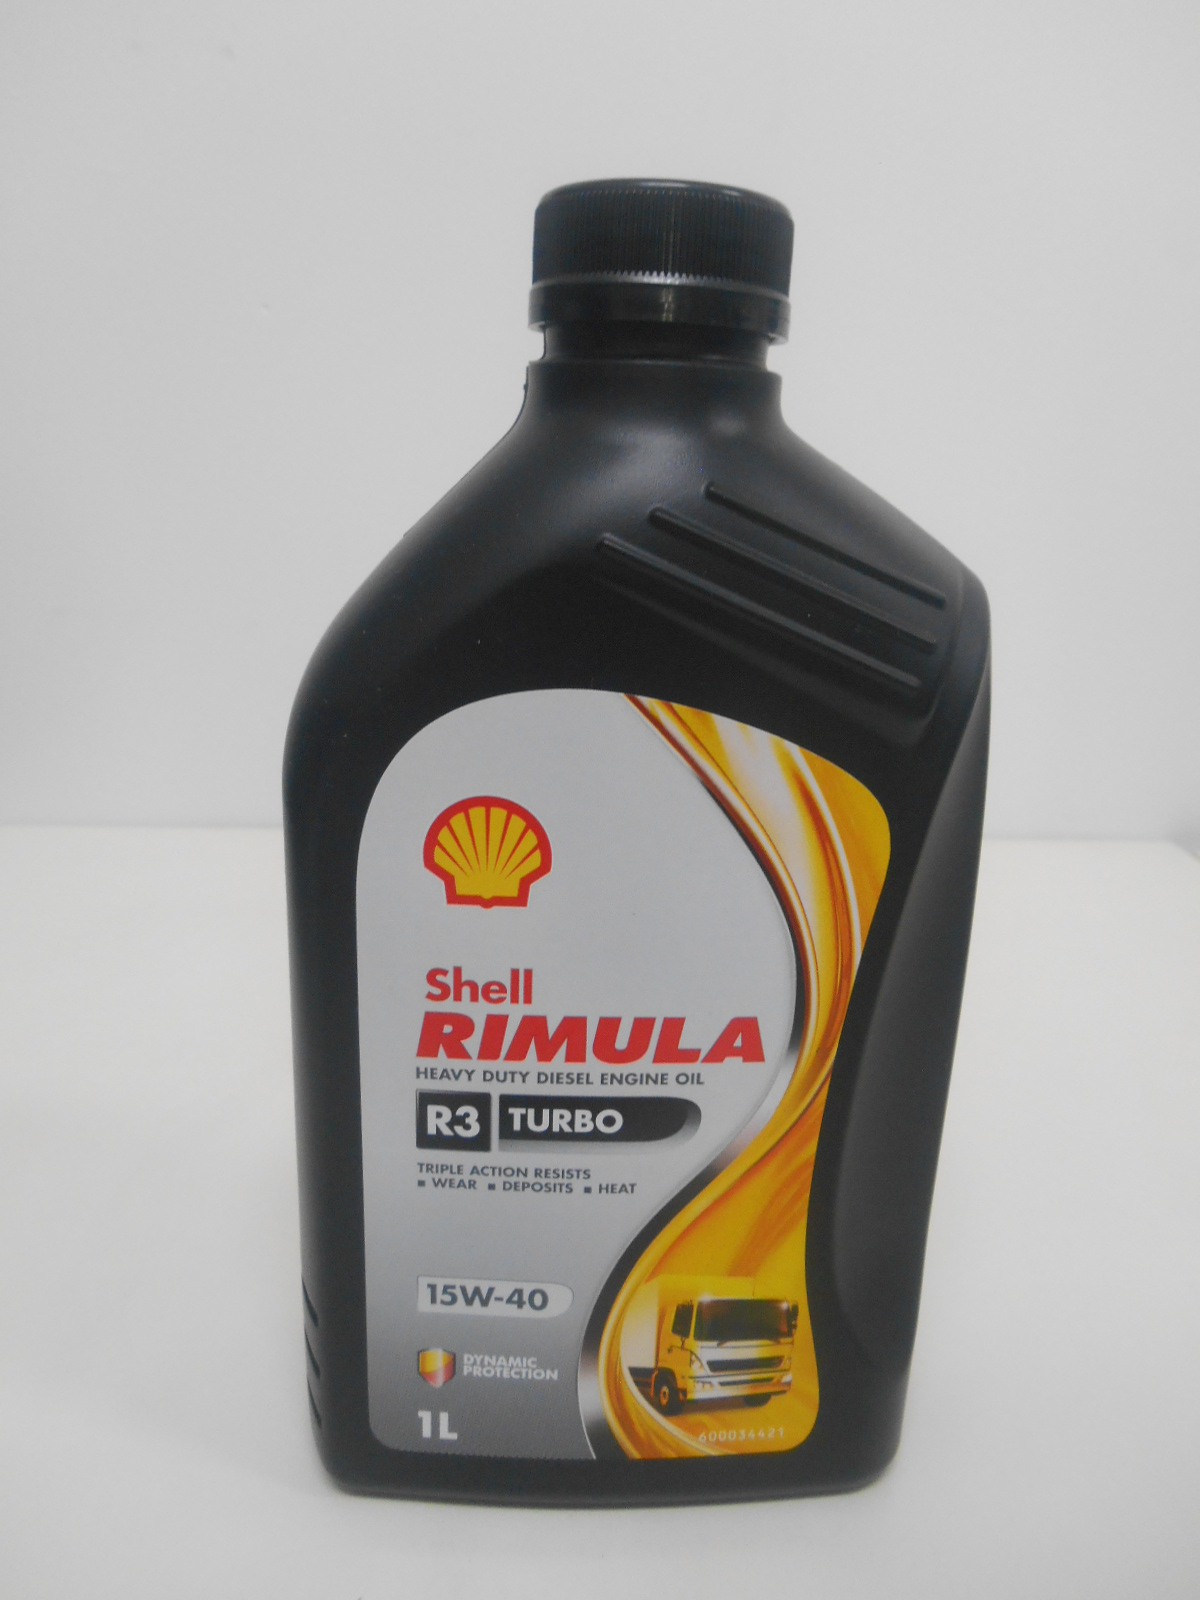 Shell rimula r3 turbo 1 l 15w 40 sejahtera oil for Shell diesel motor oil